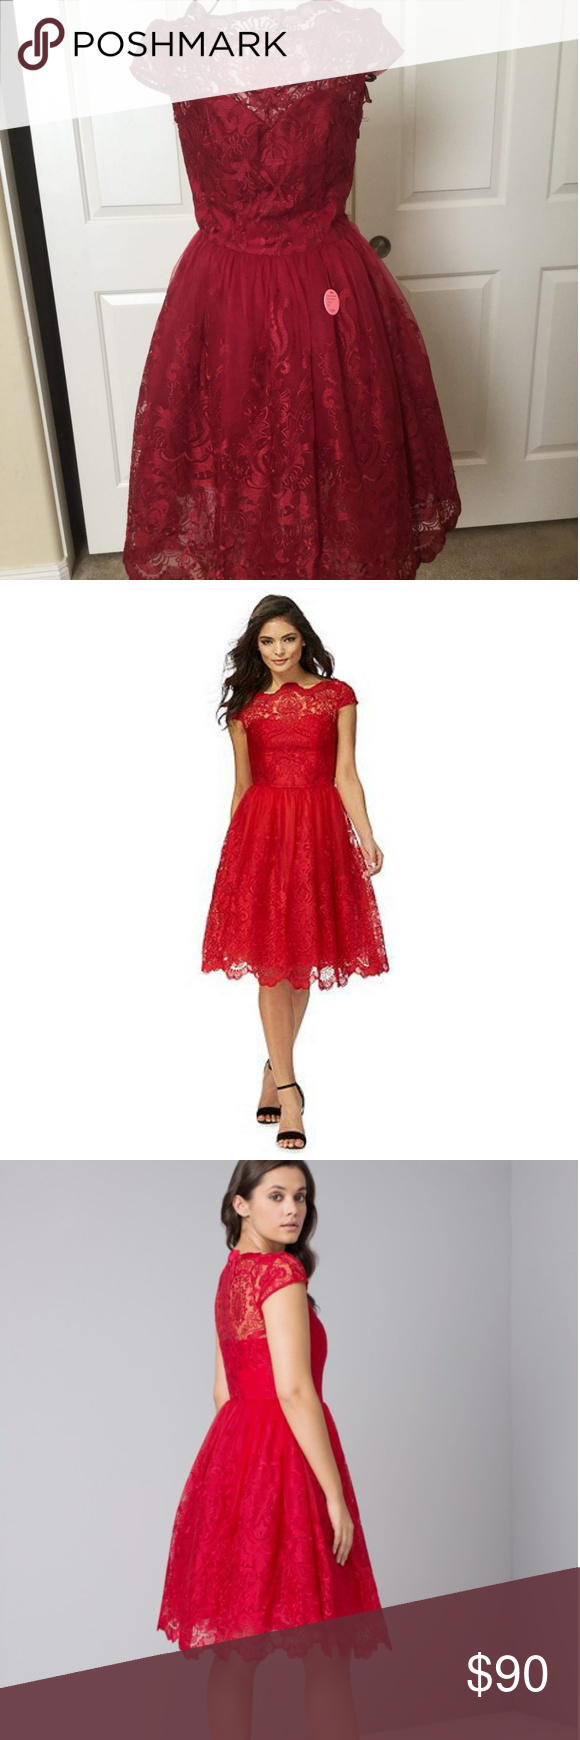 e29a5364307ad Chi Chi London Size 0 2 Dione Dress Red